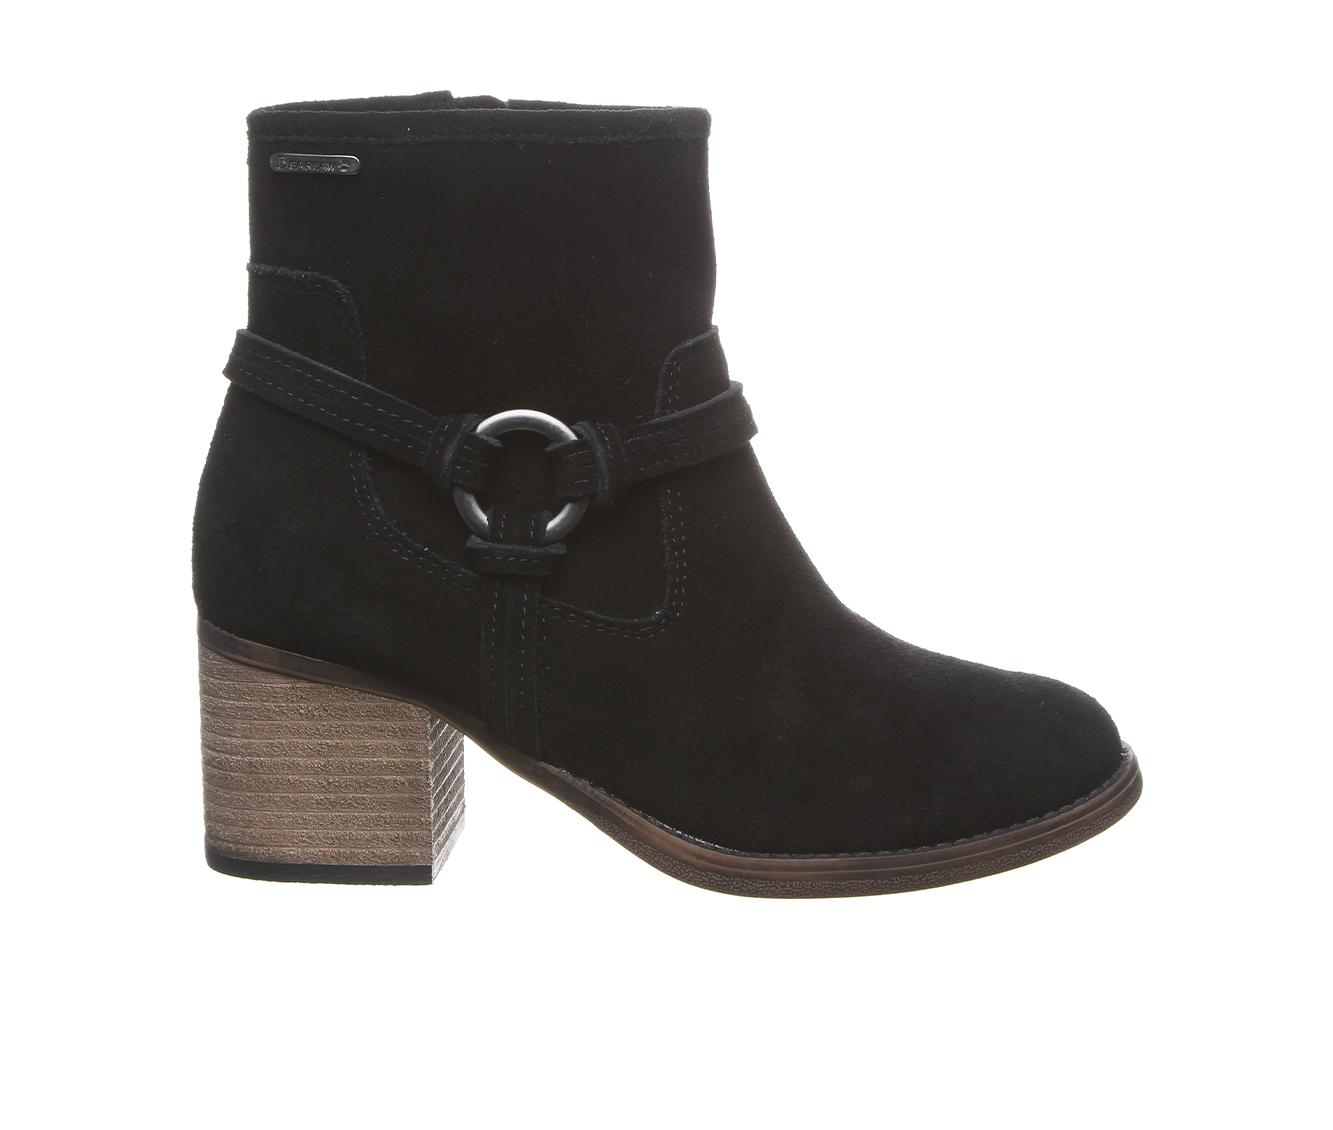 Bearpaw Mica Women's Boot (Black Suede)